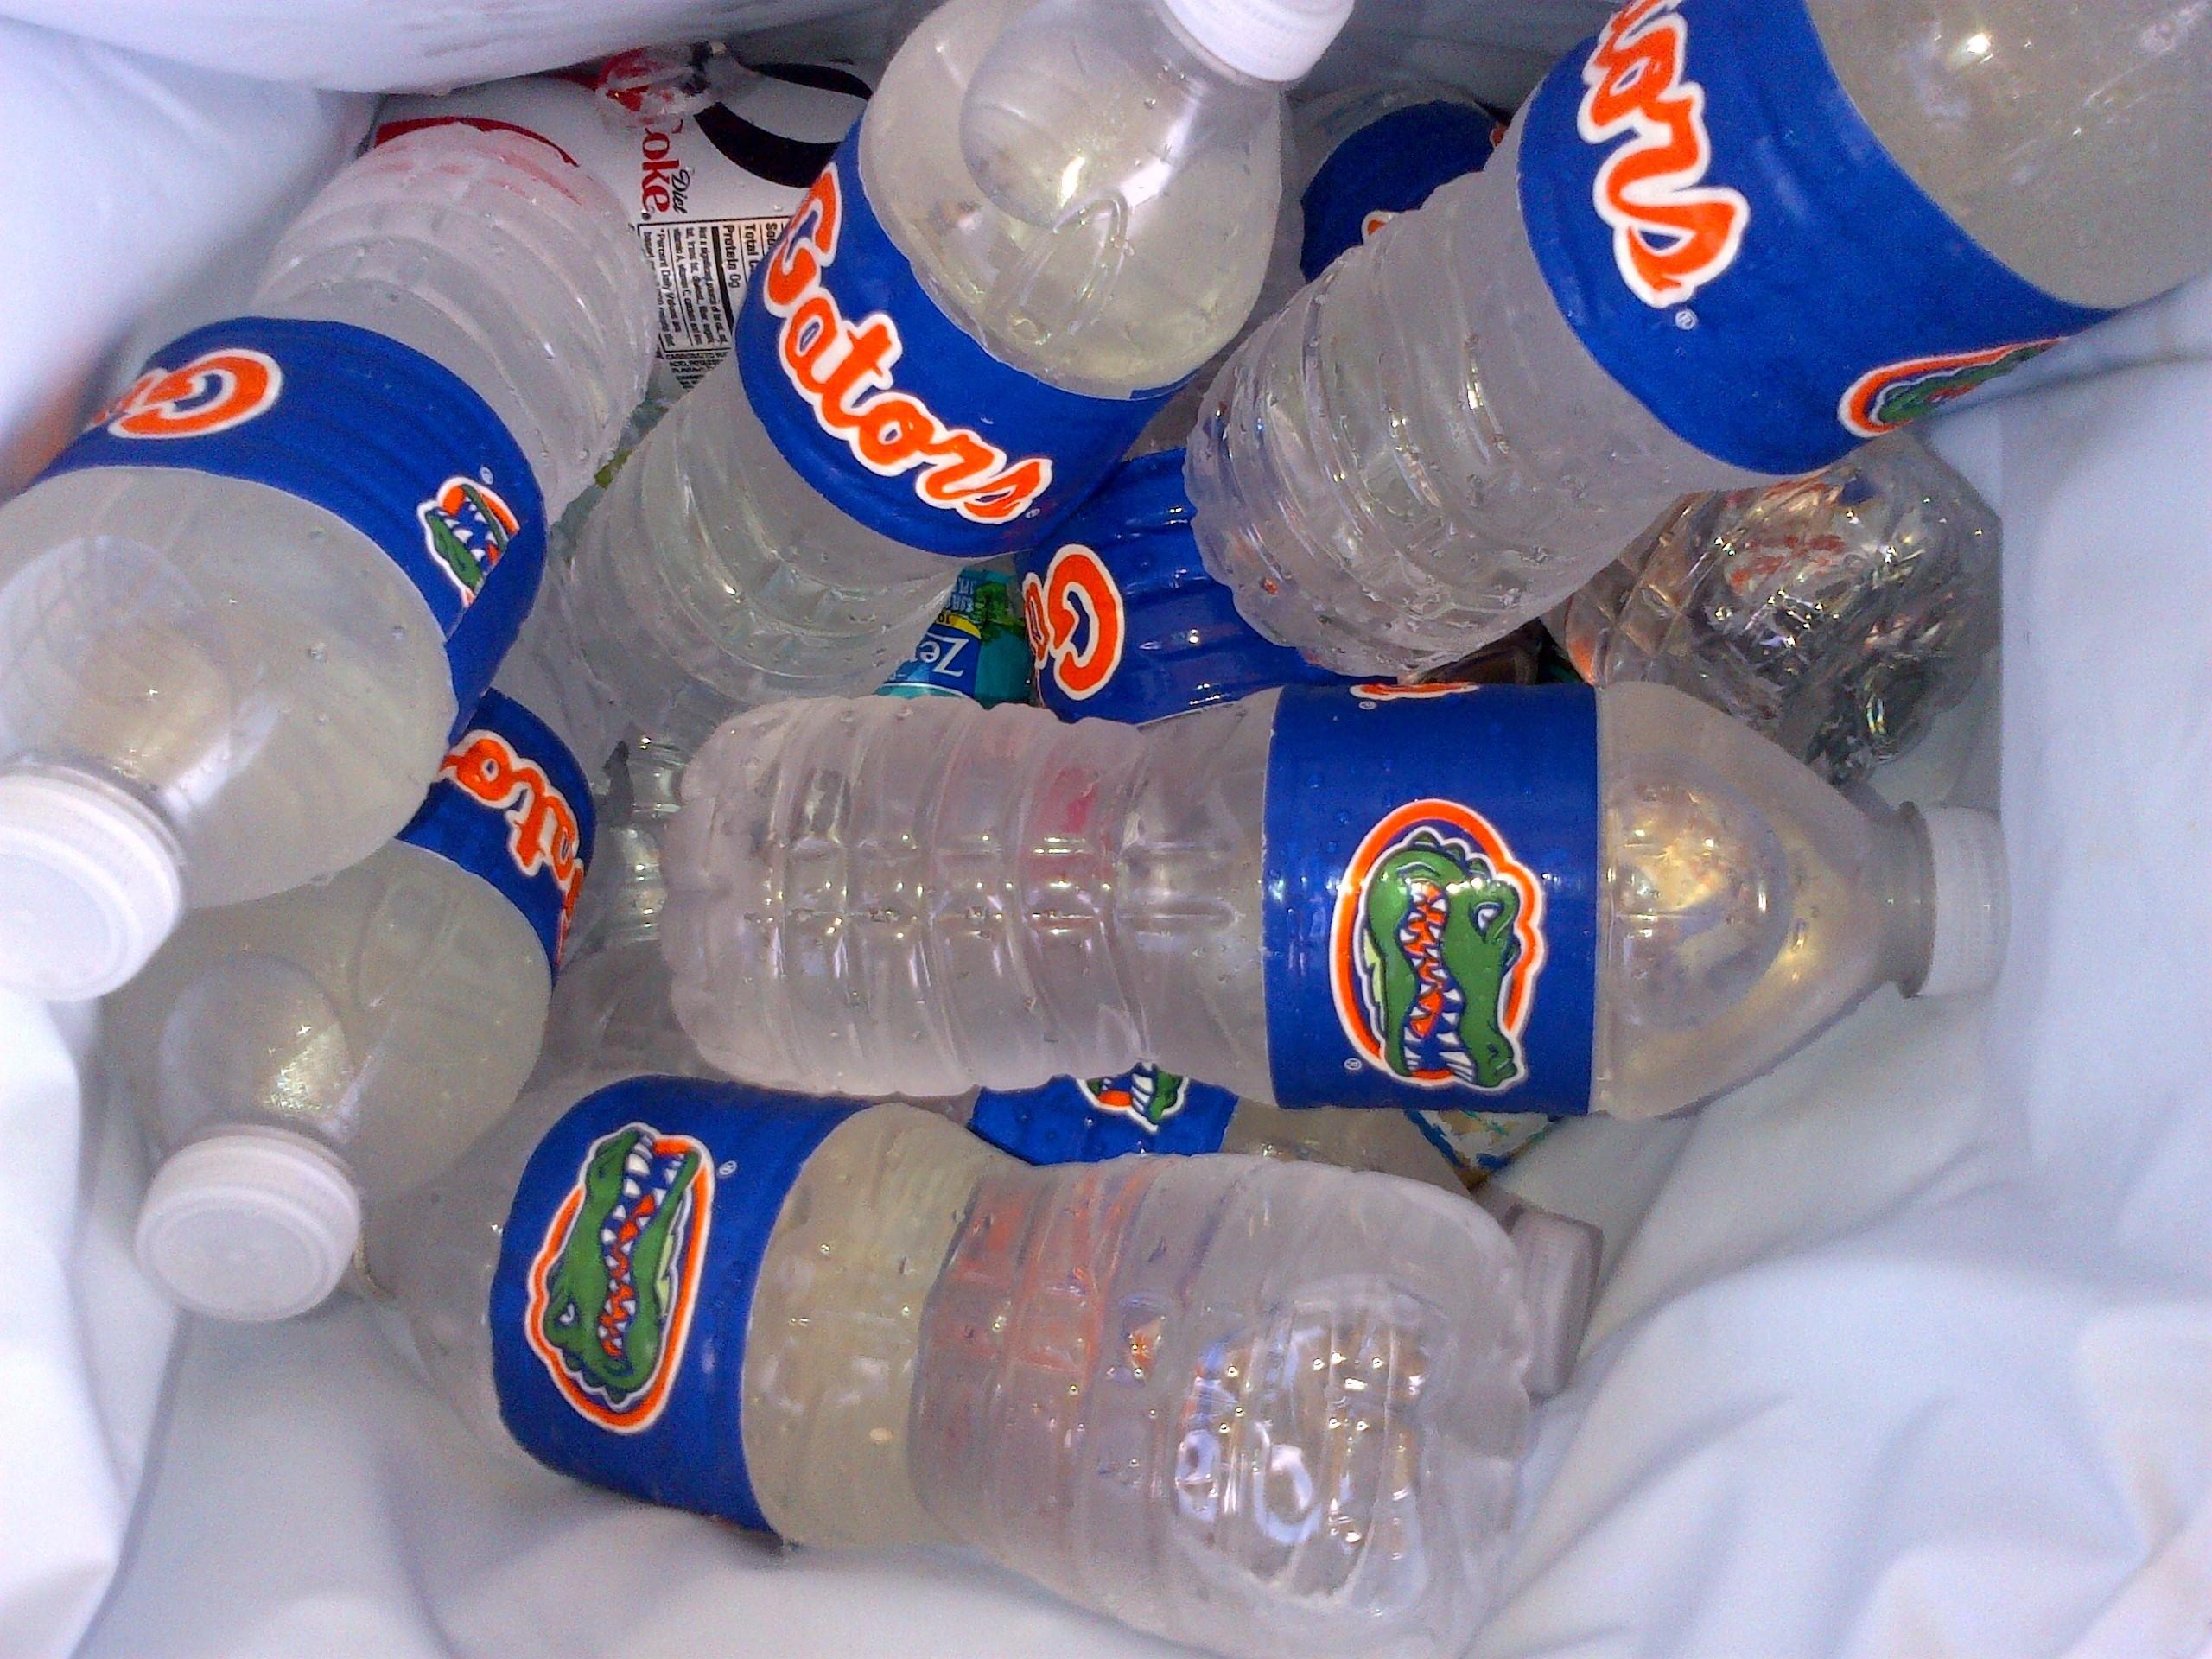 Florida Gator Water Bottles (made with duct tape)   University of Florida  TailGATOR  